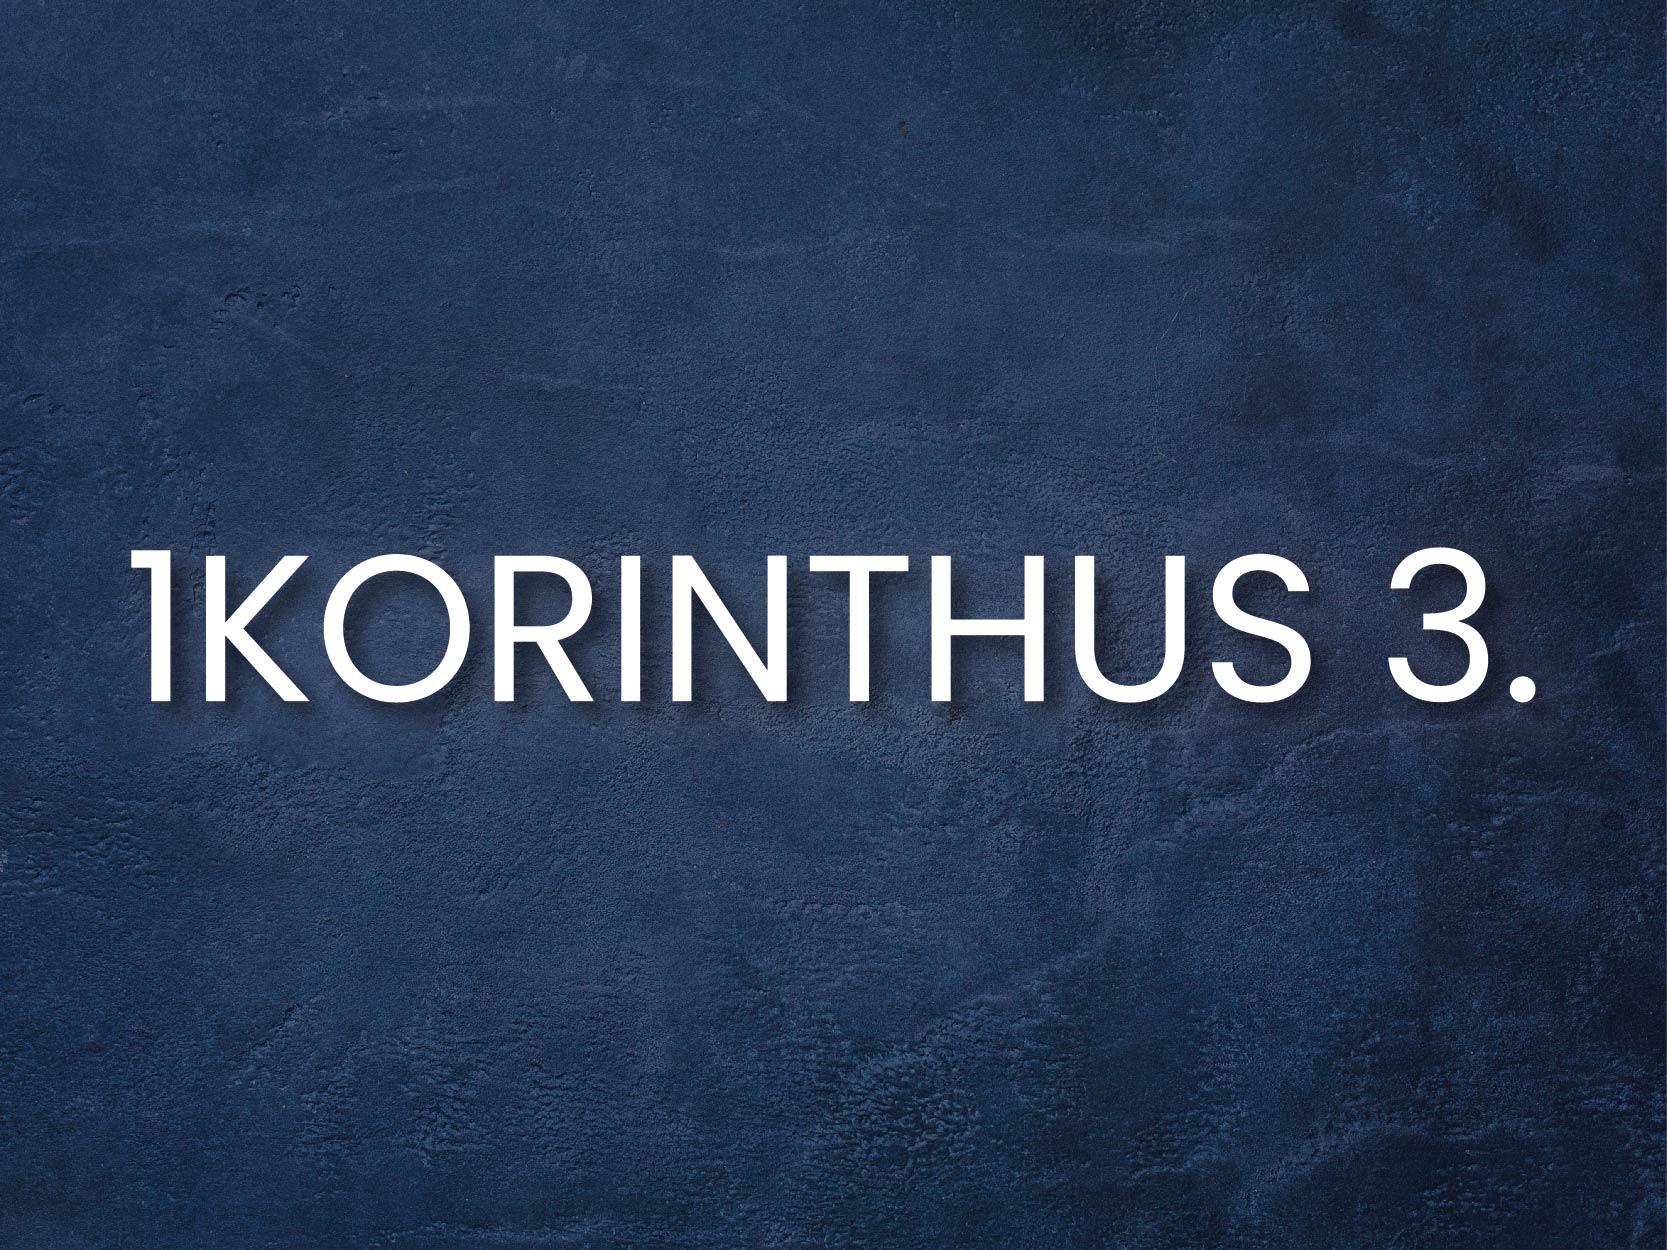 INFO_korinthus_3